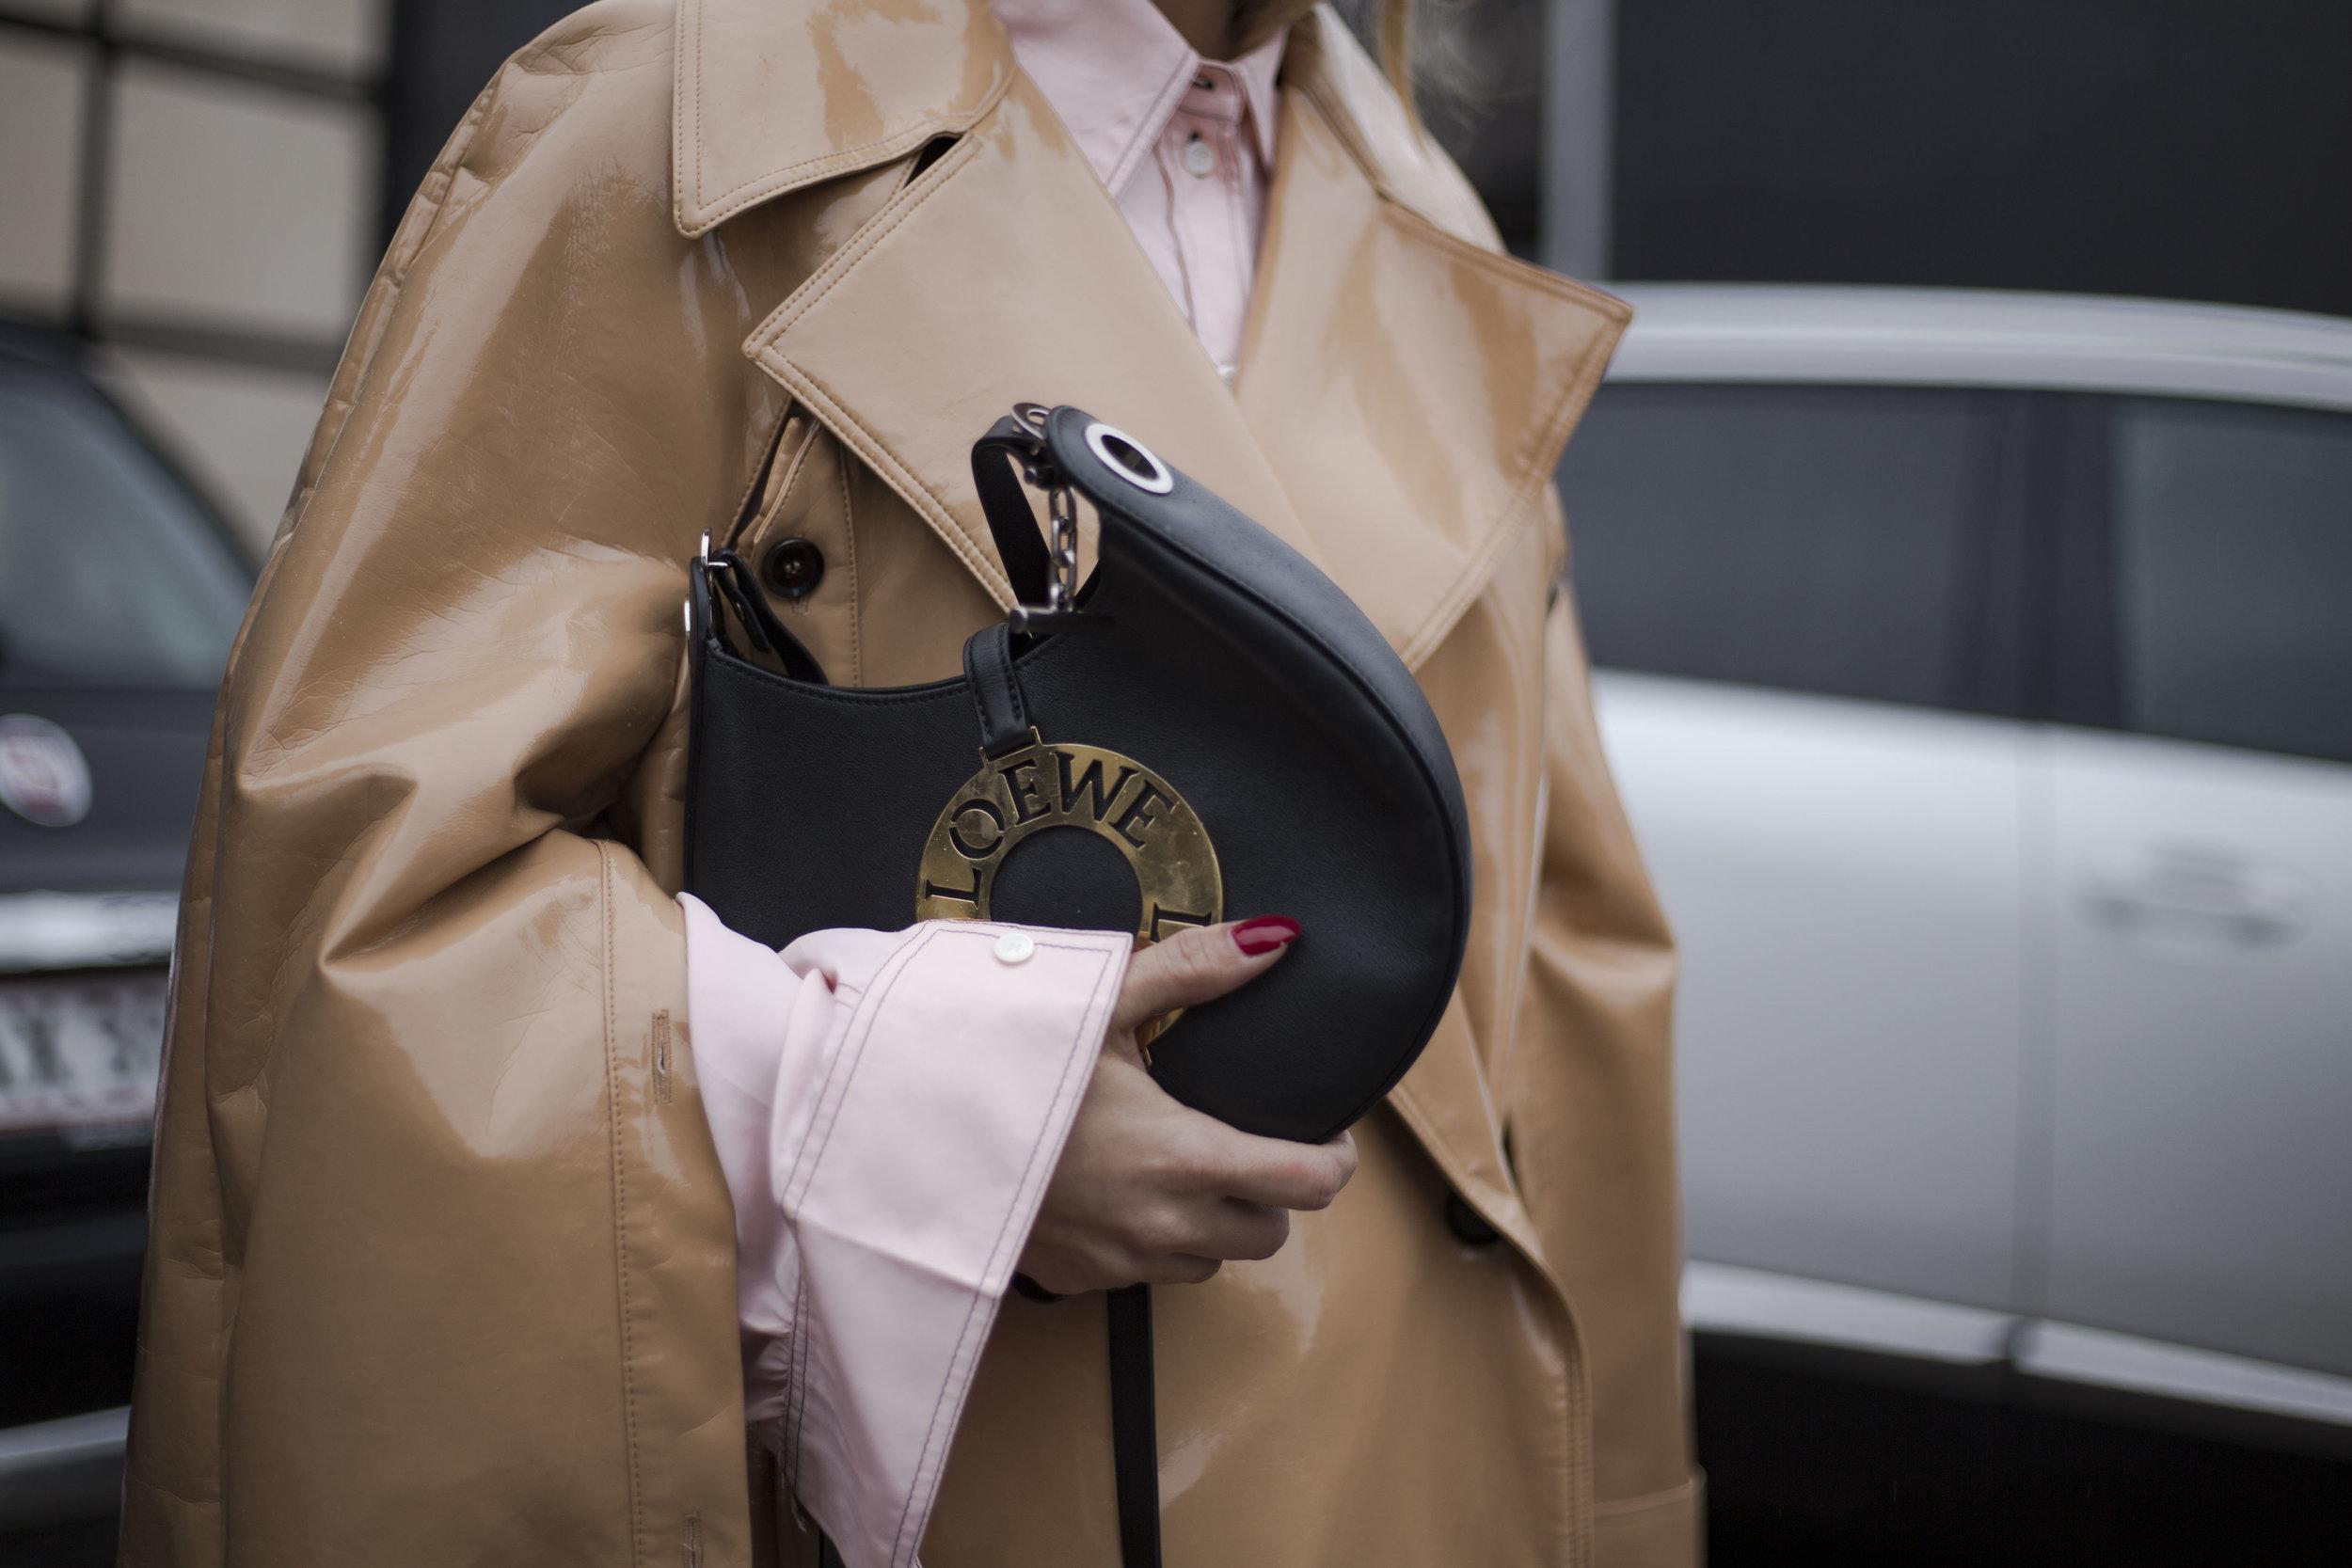 copenhagen-fashionweek-street-style-streetstyle-thestreetland-fashion-janka-polliani.jpg